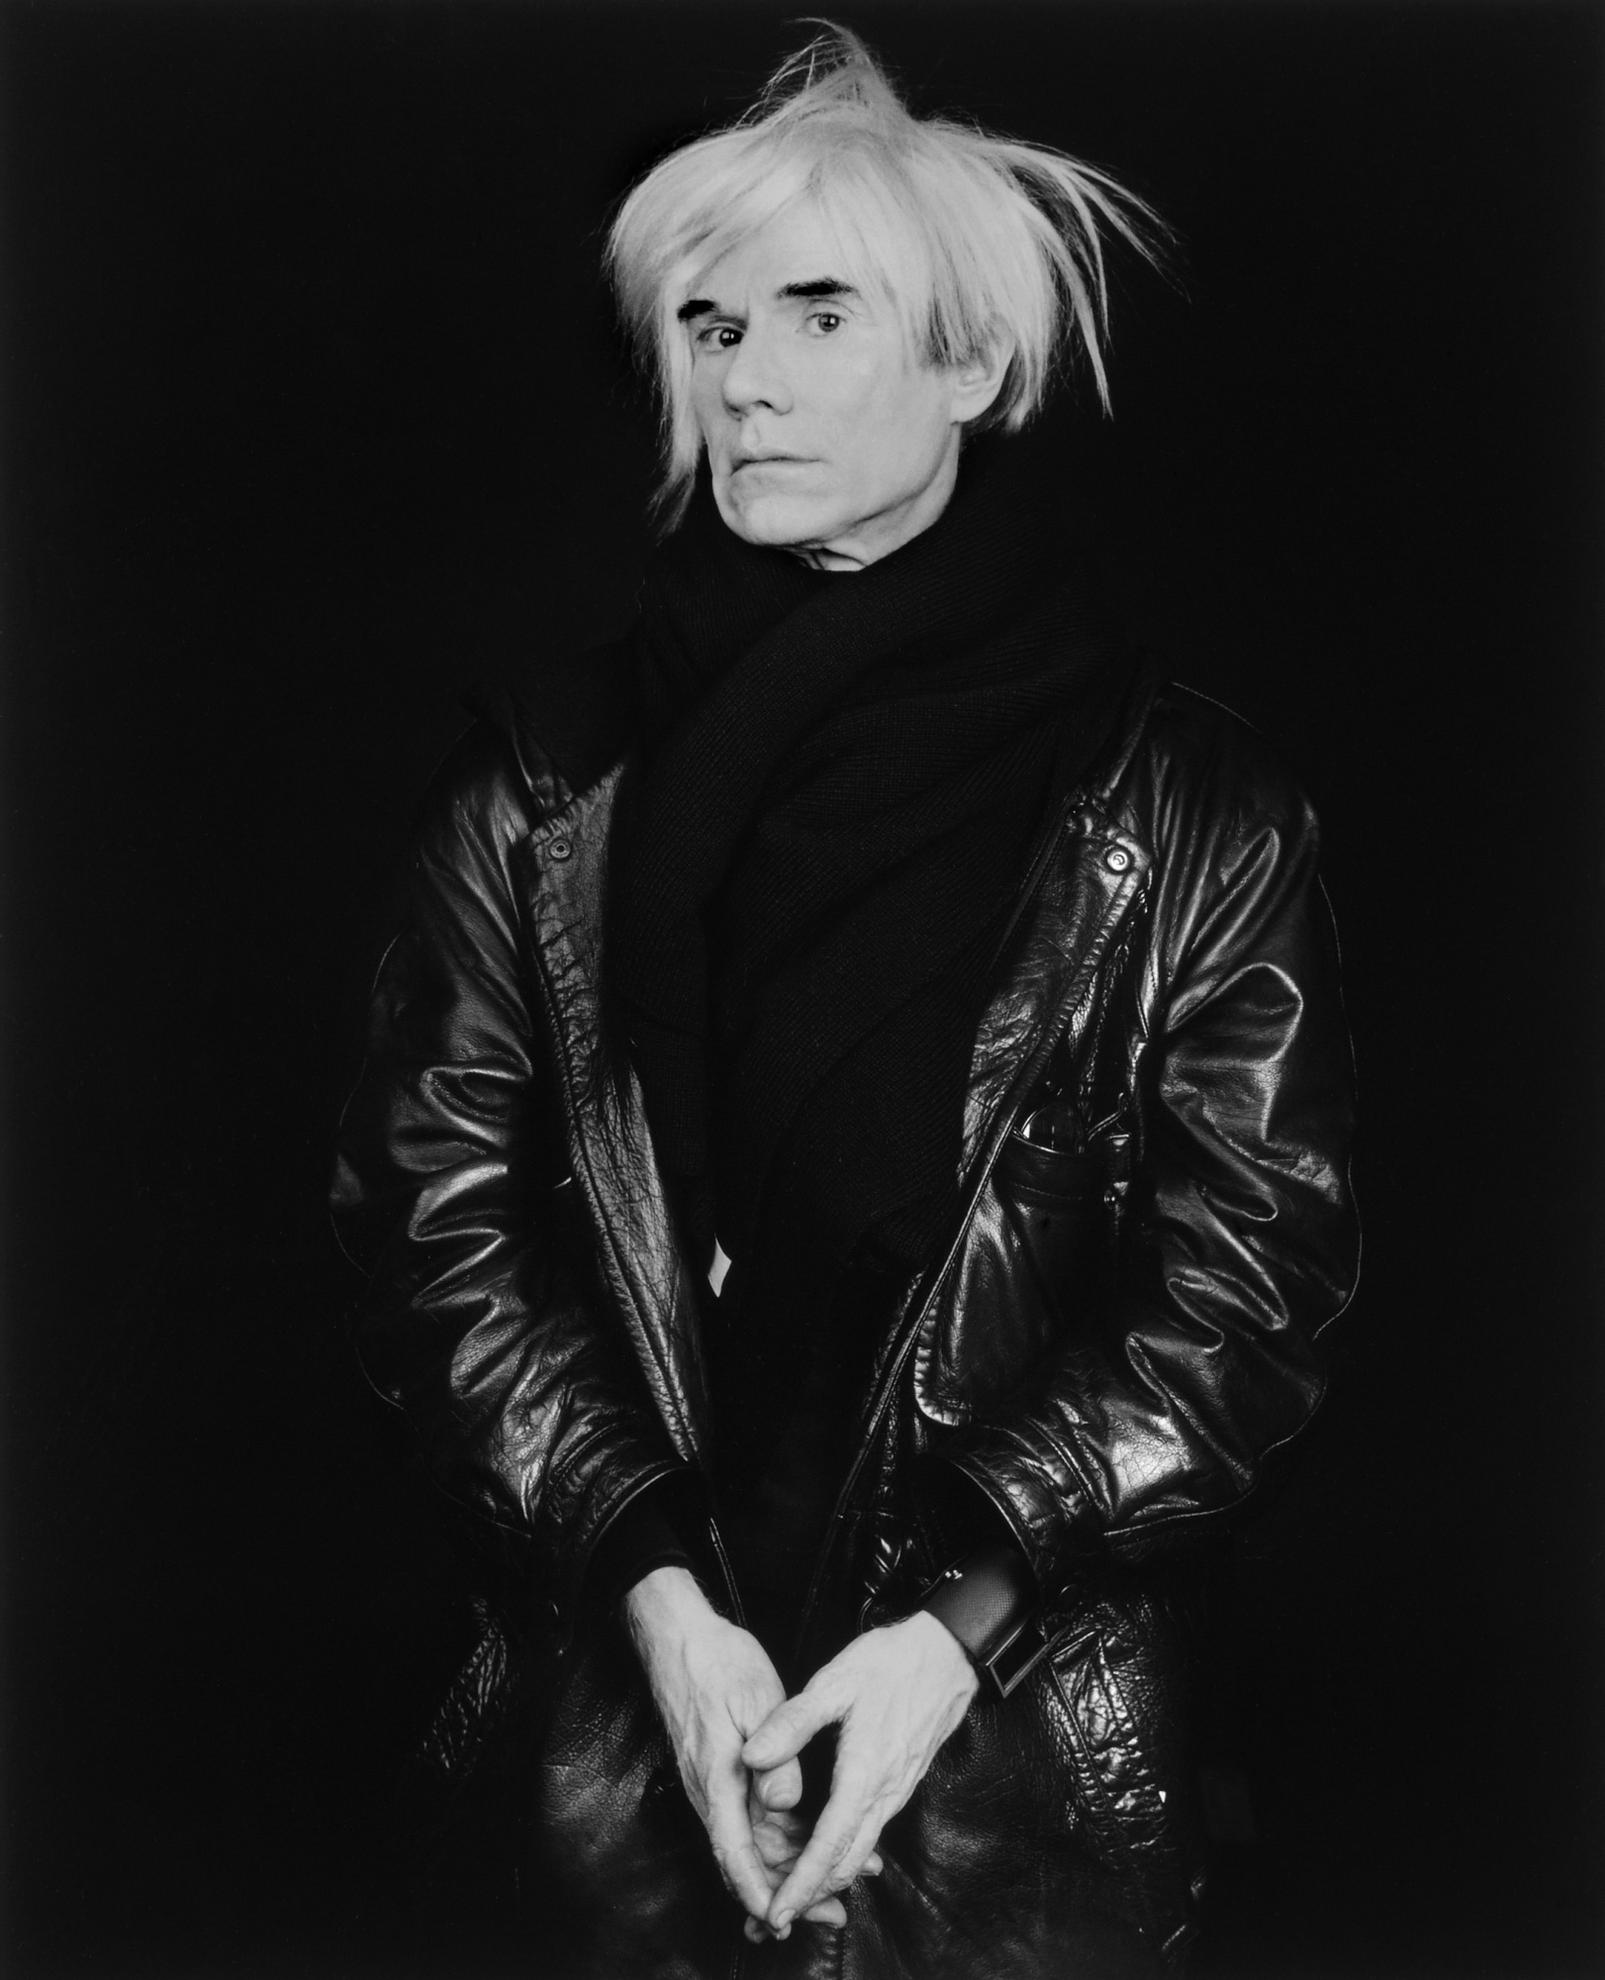 Robert Mapplethorpe-Andy Warhol-1986